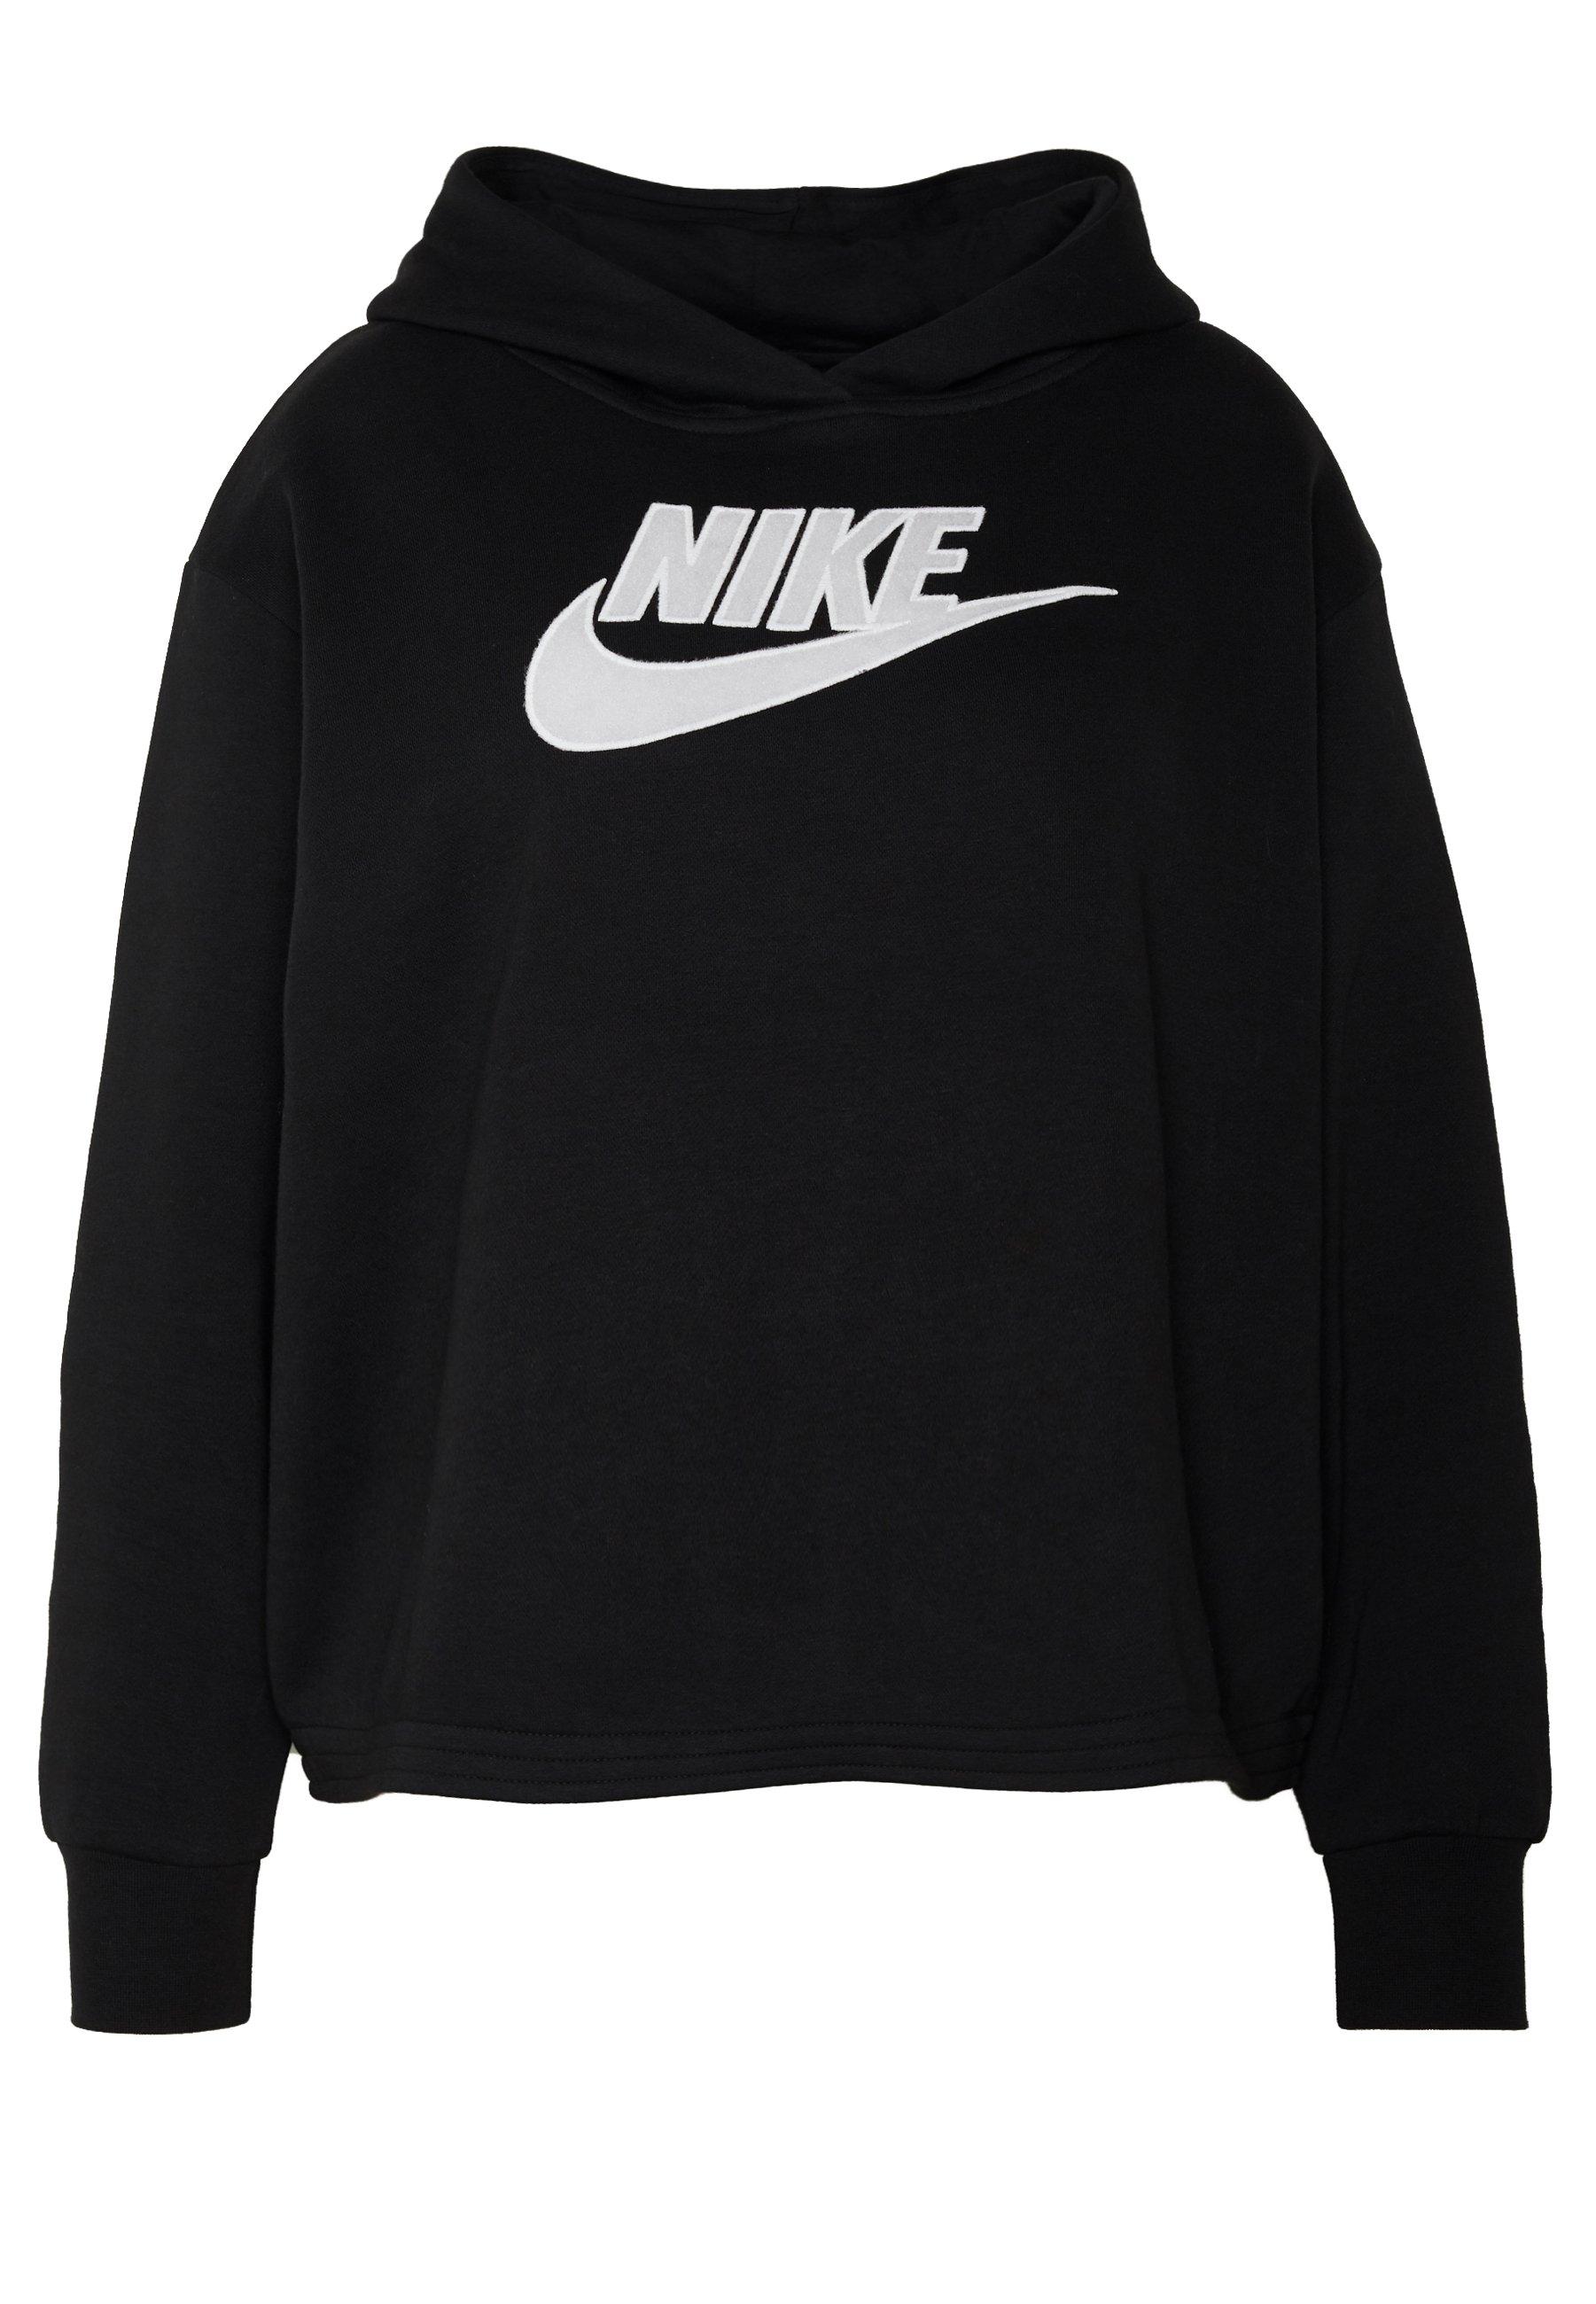 Nike Sportswear PLUS SIZE ICON CLASH PATCHES FLEECE HOODIE - Hoodie - black